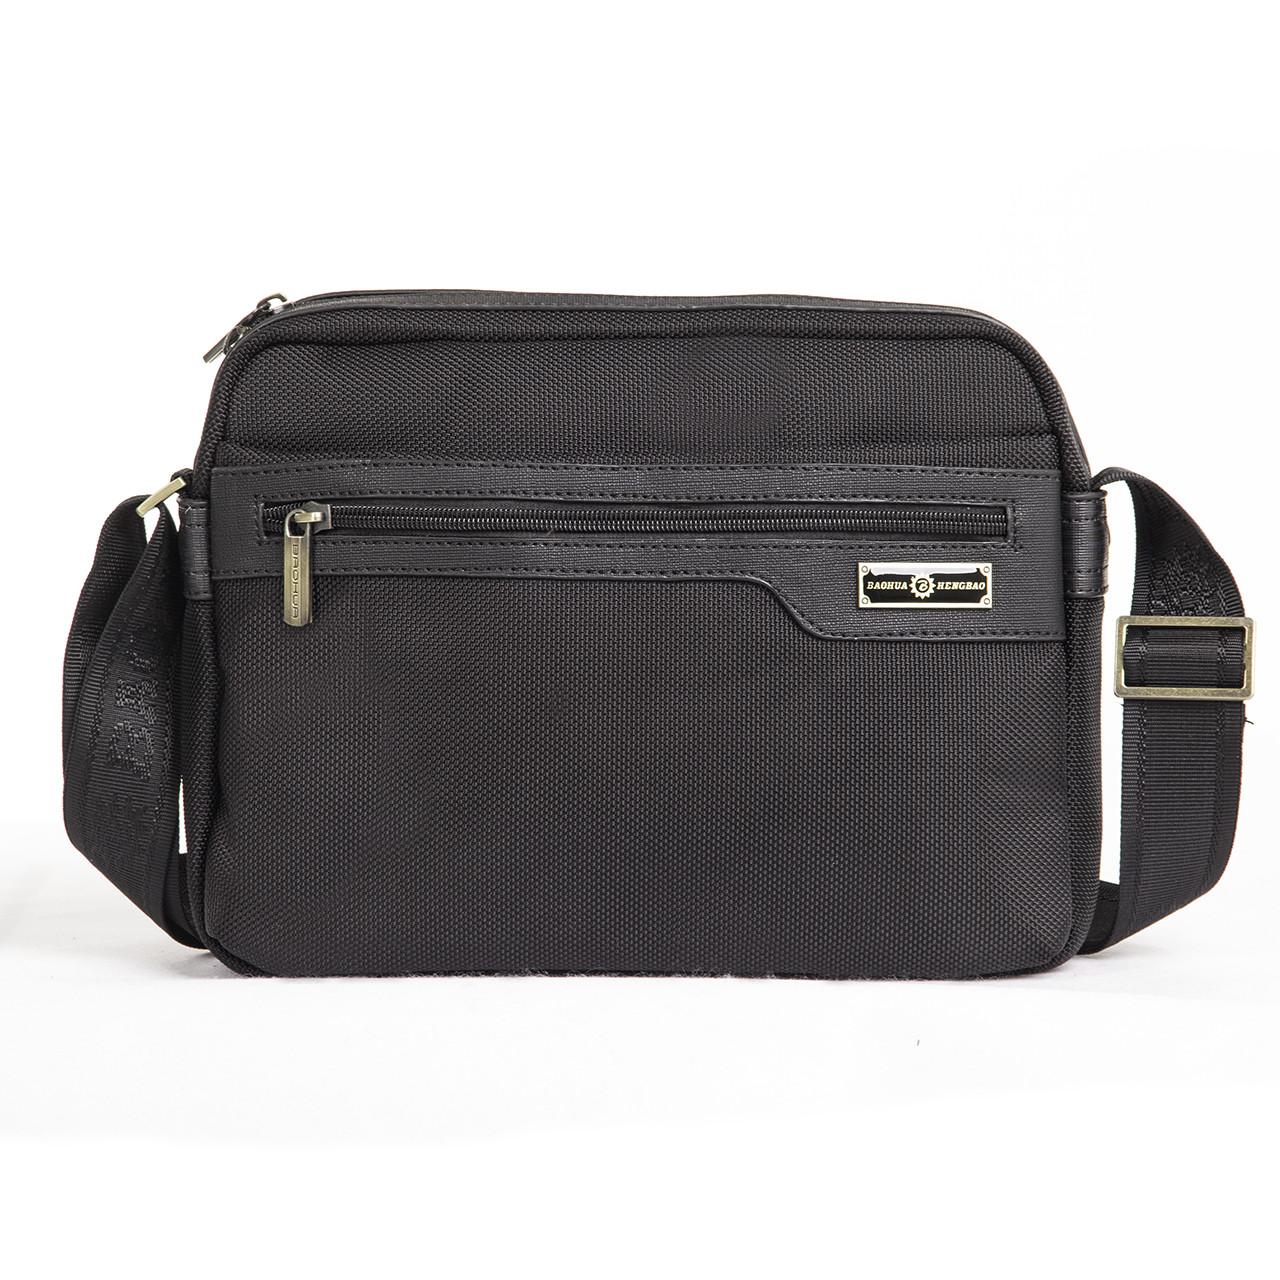 Чоловіча сумка BAOHUA чорна 28х21х8 тканина Оксфорд горизонтальна ксВН8159-11,5 год